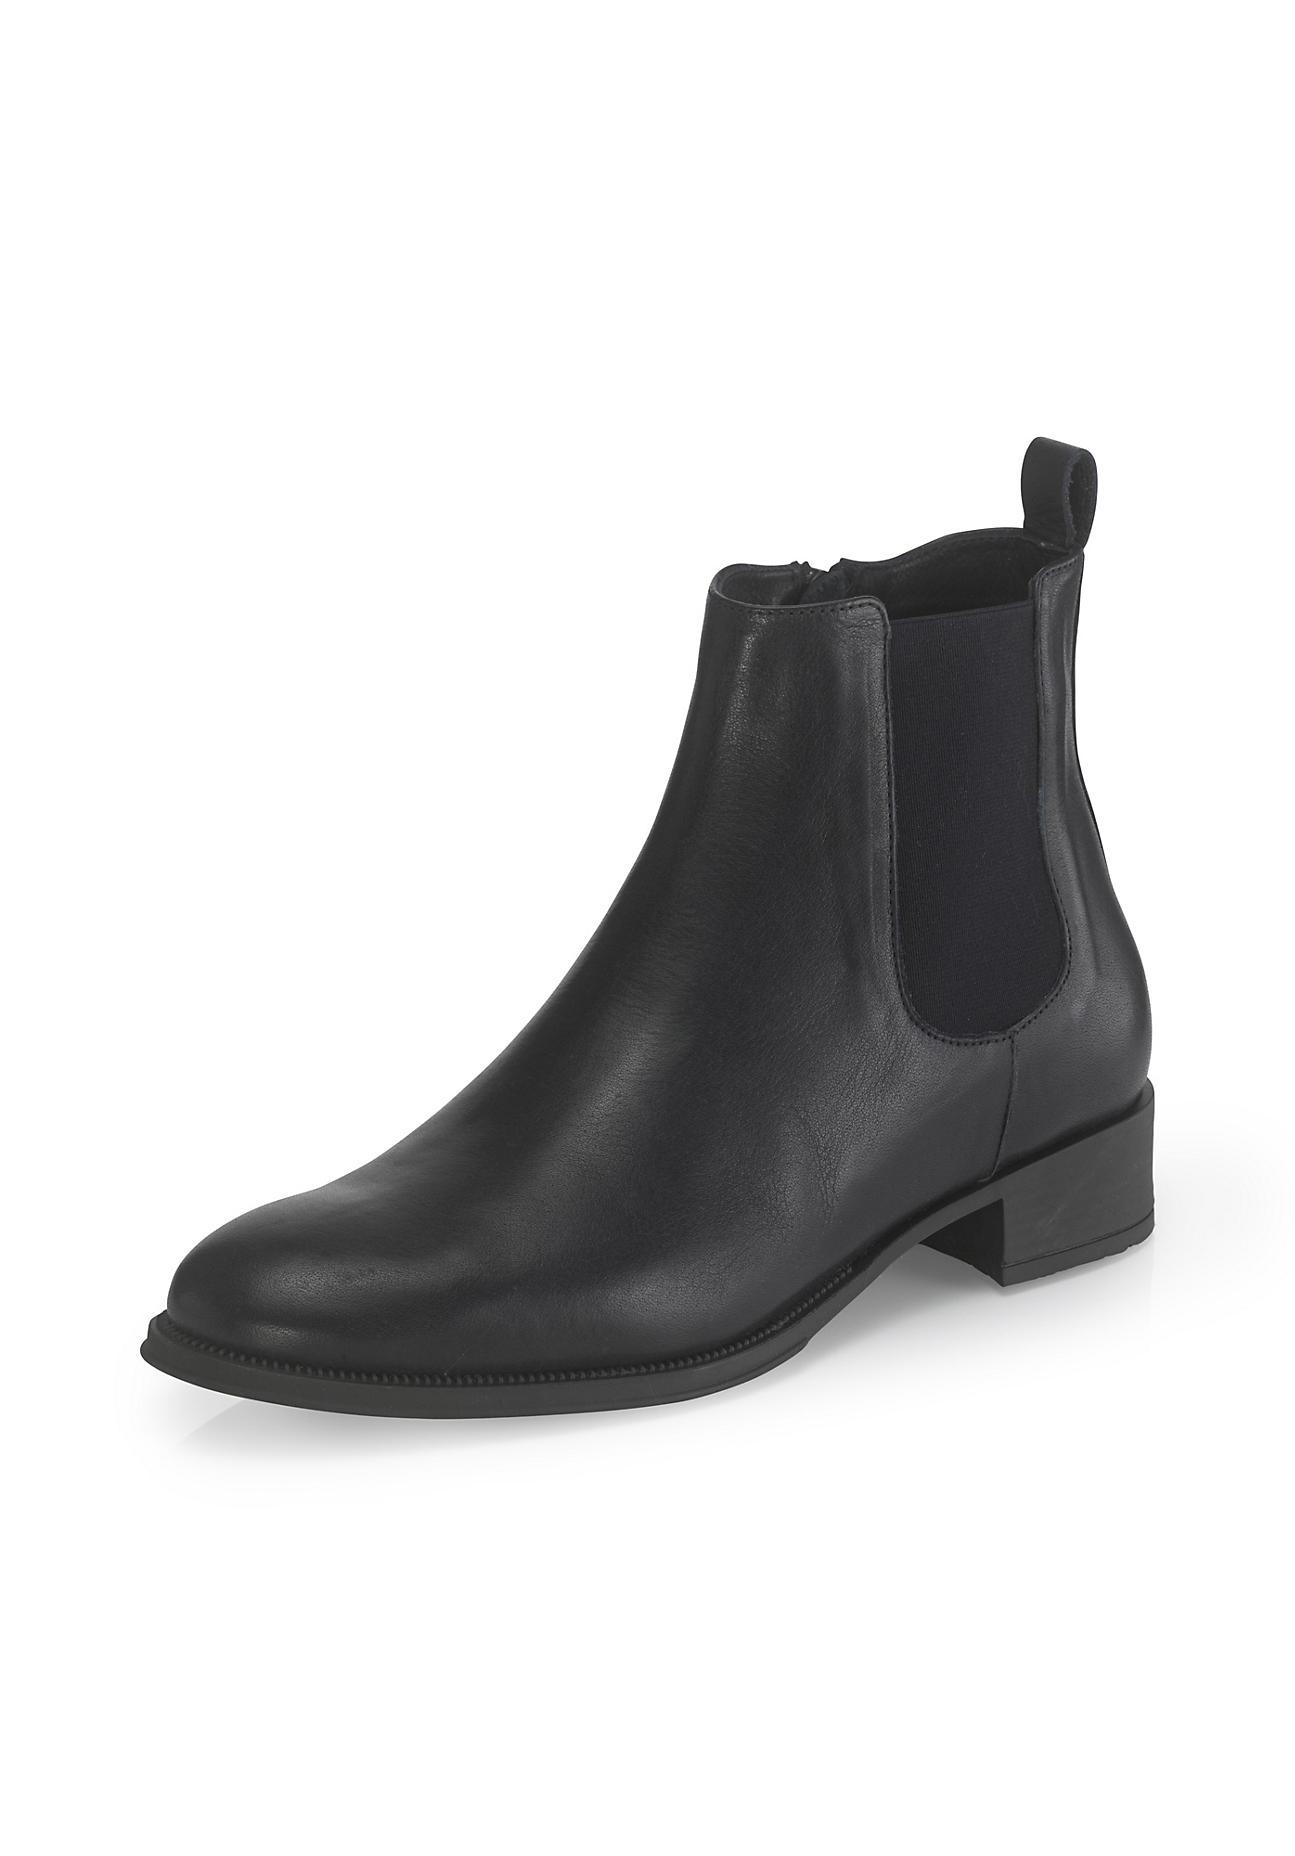 Stiefel - hessnatur Damen Damen Stiefelette aus chromfrei gegerbtem Leder – schwarz –  - Onlineshop Hessnatur